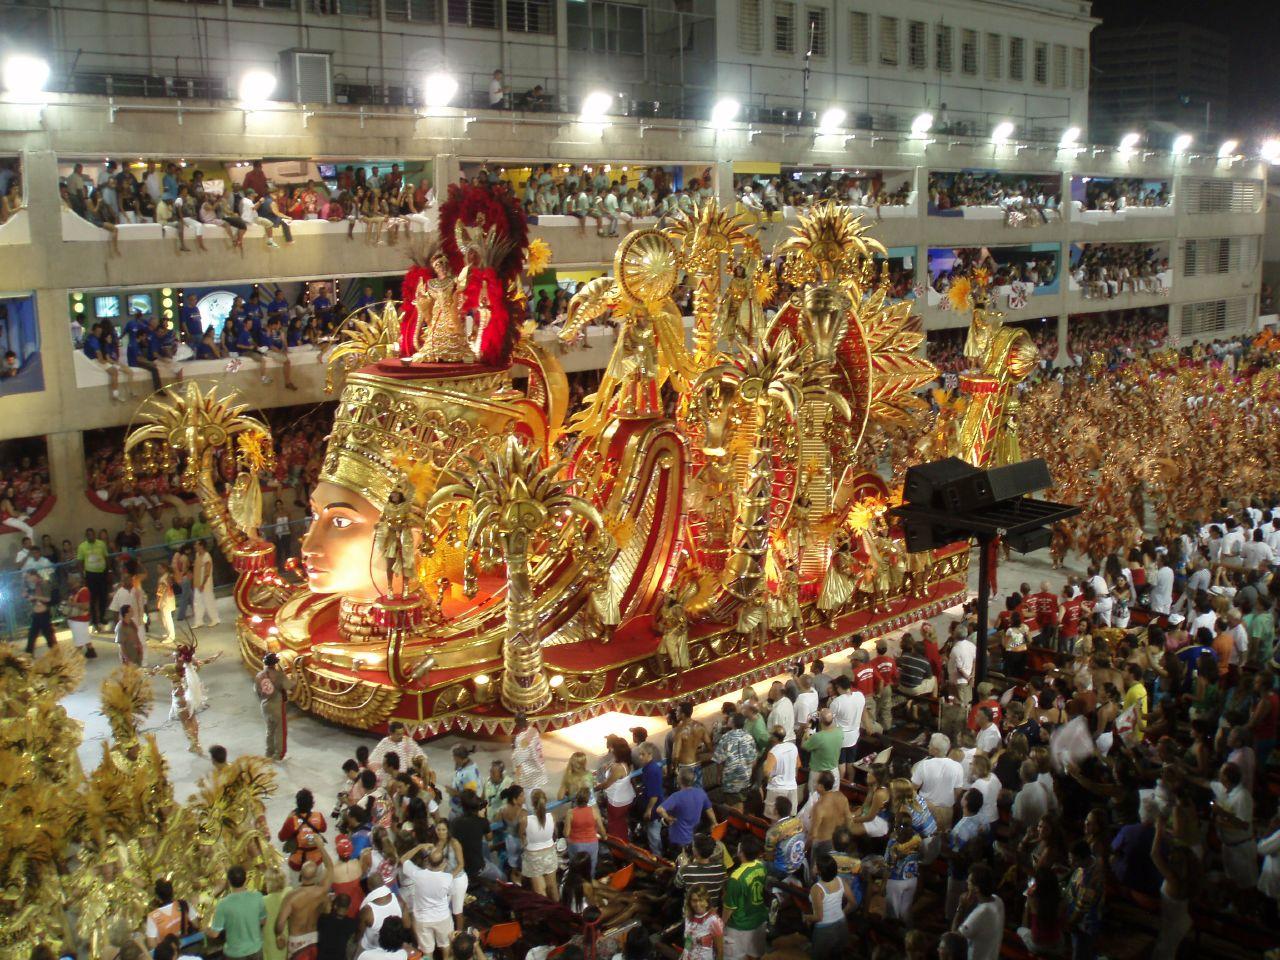 Celebration - Carnival Cruise Lines